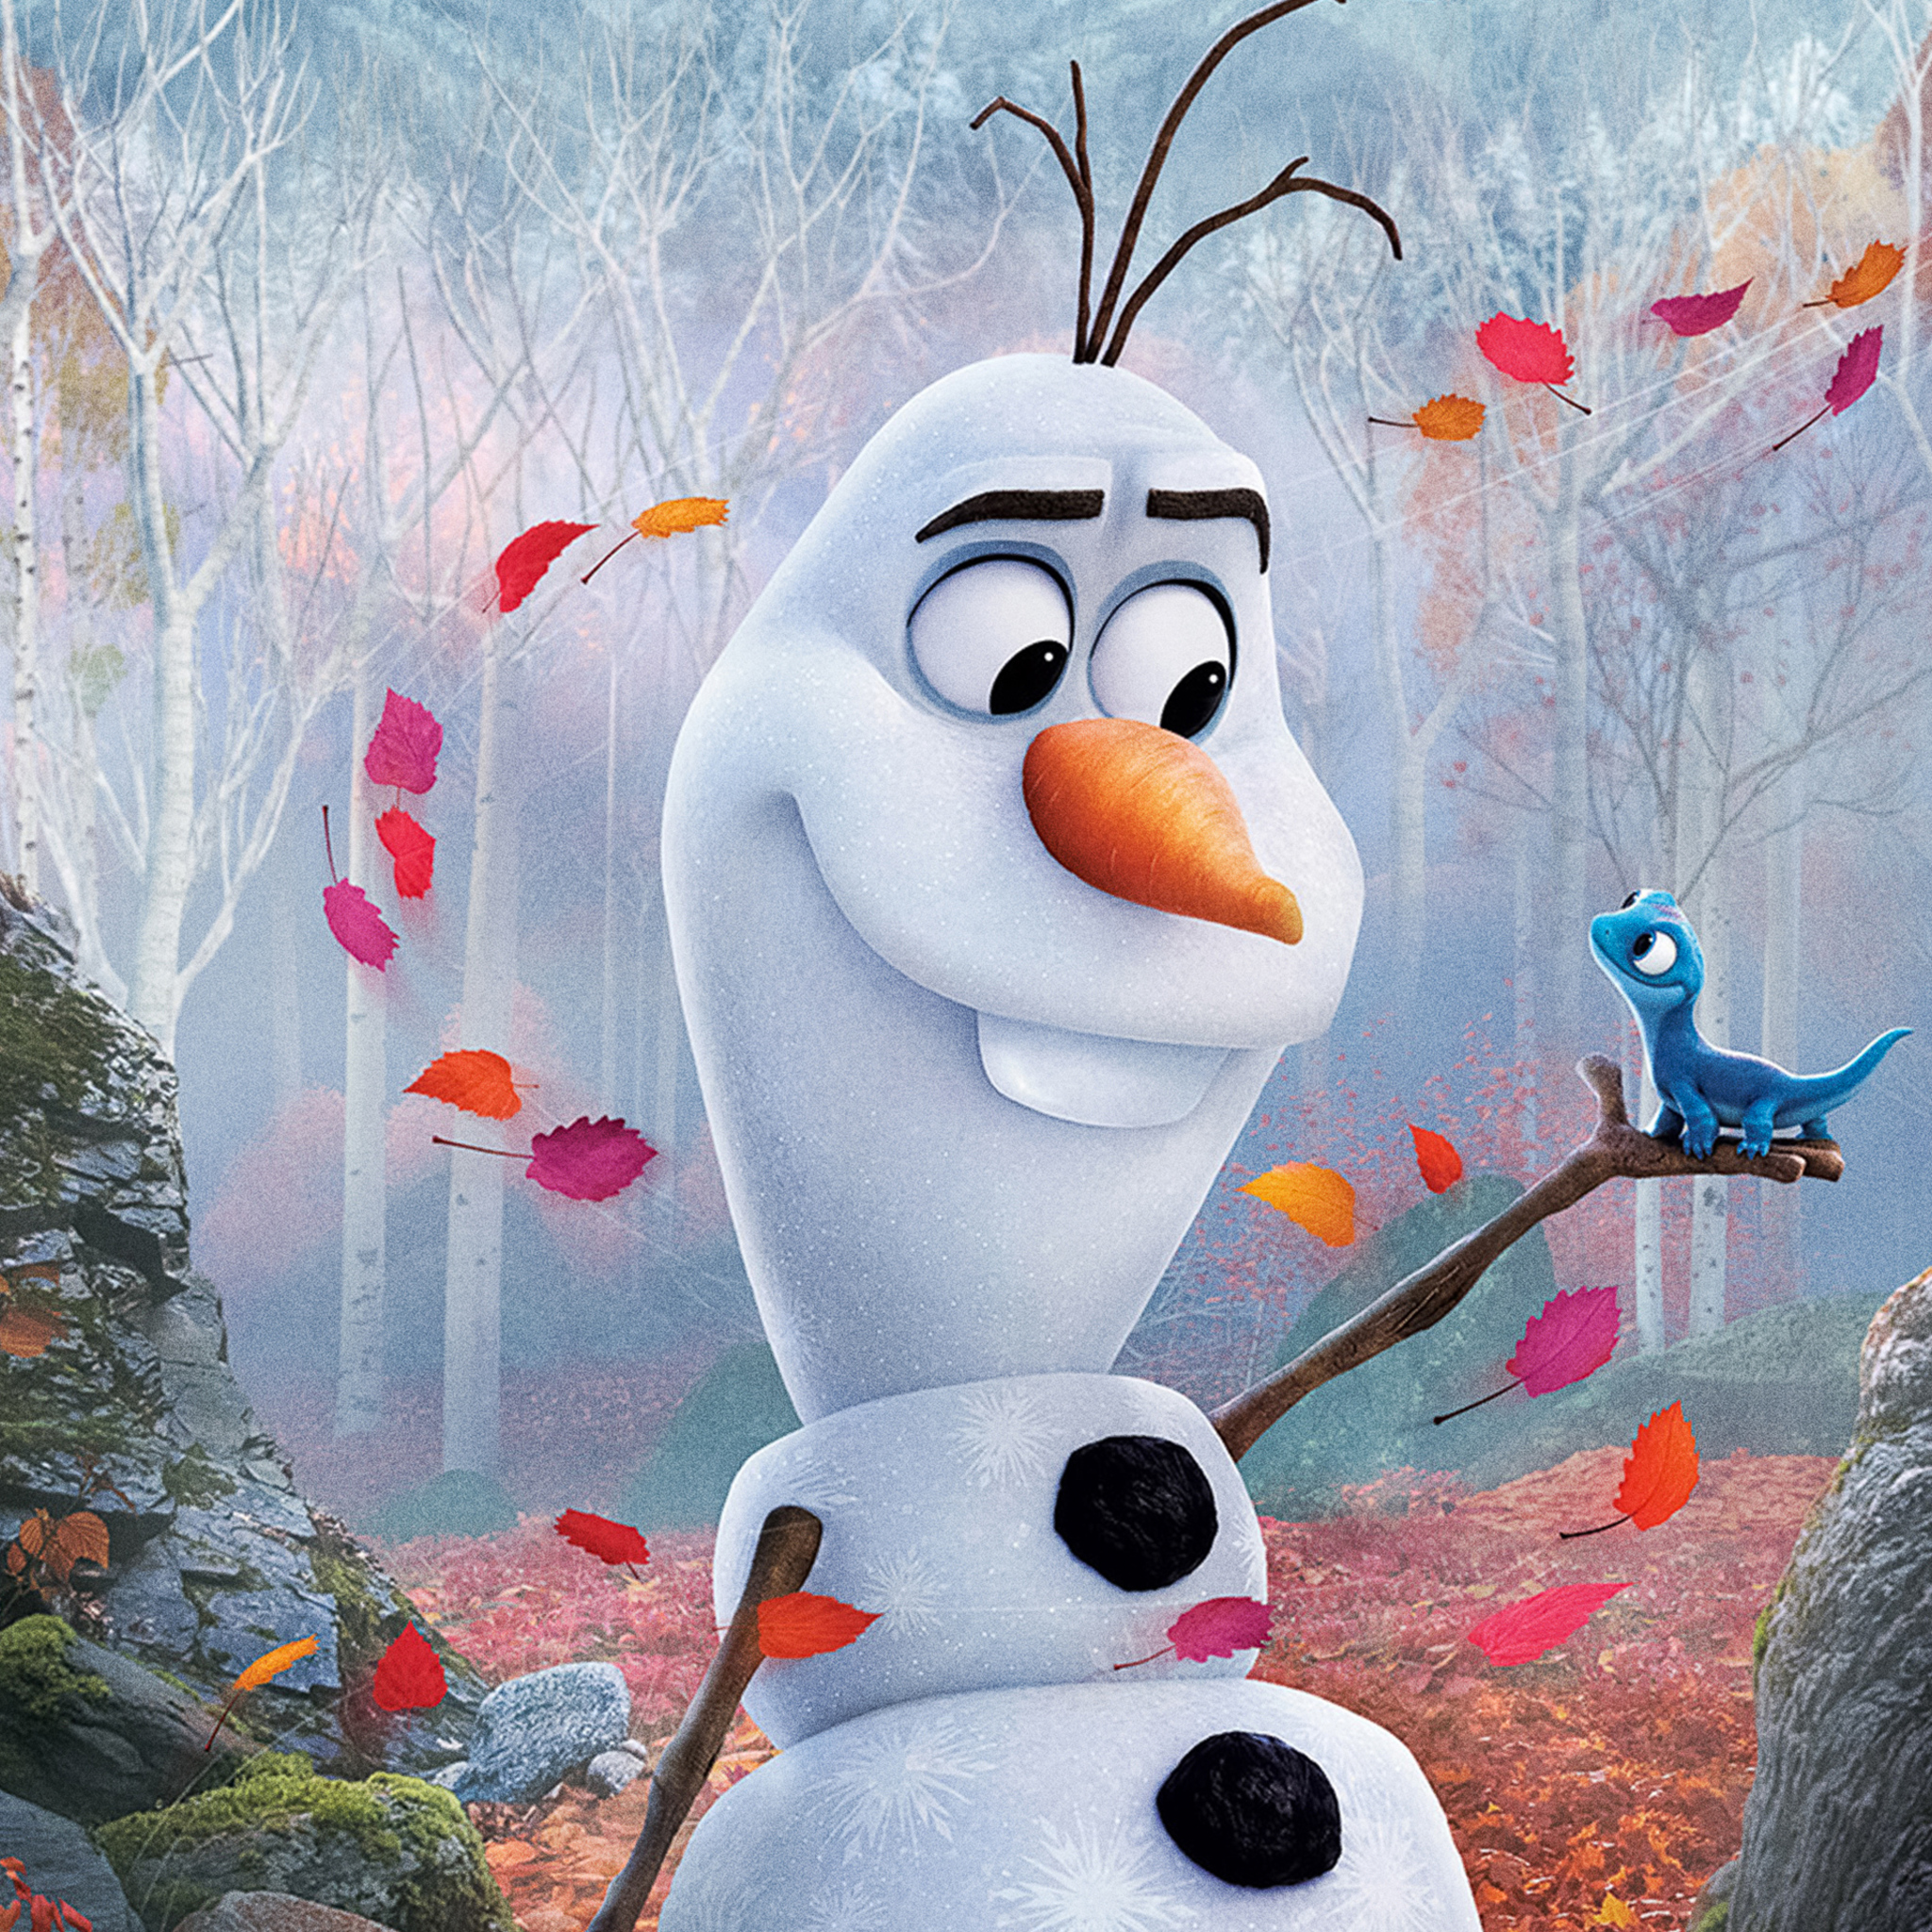 2048x2048 Olaf In Frozen 2 2019 Ipad Air Hd 4k Wallpapers